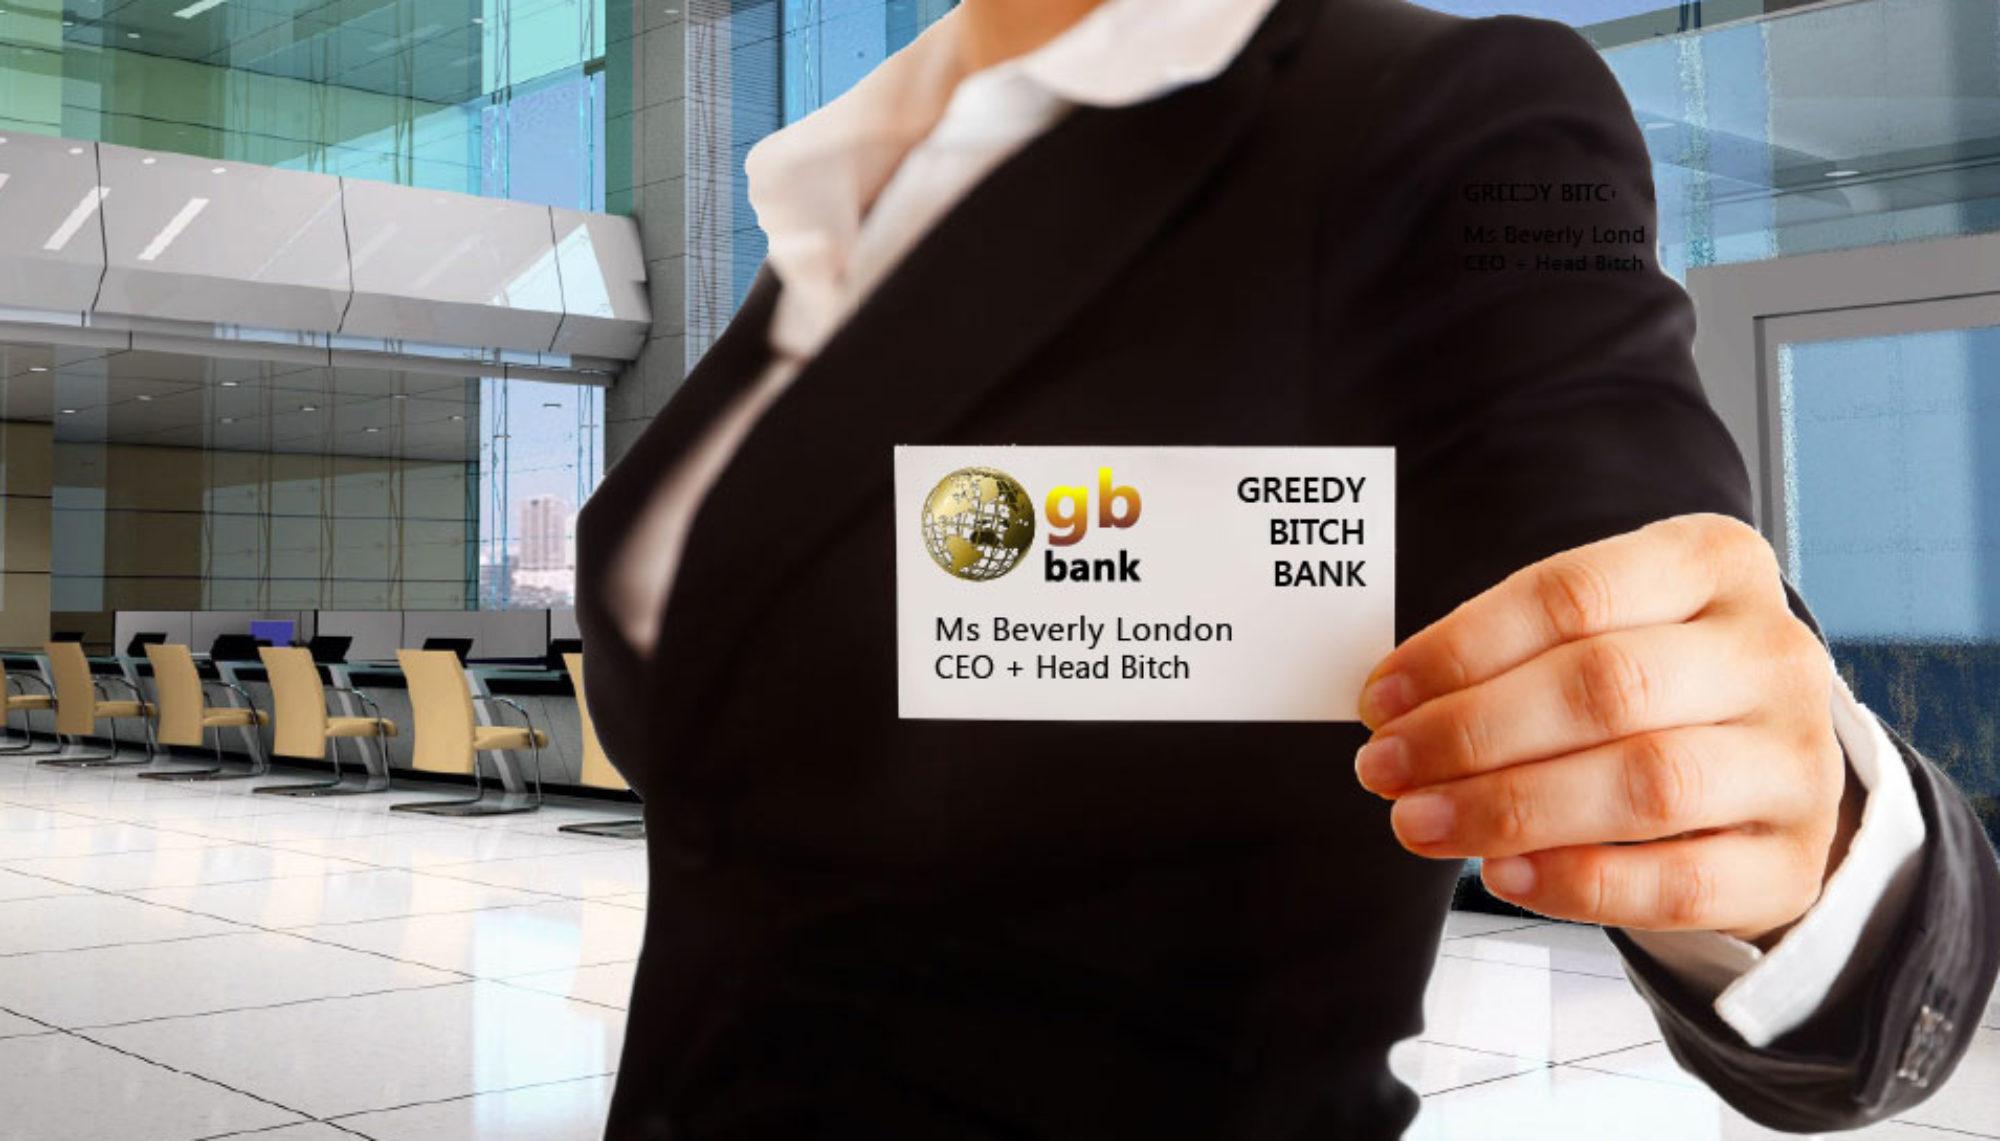 greedybitchbank.com